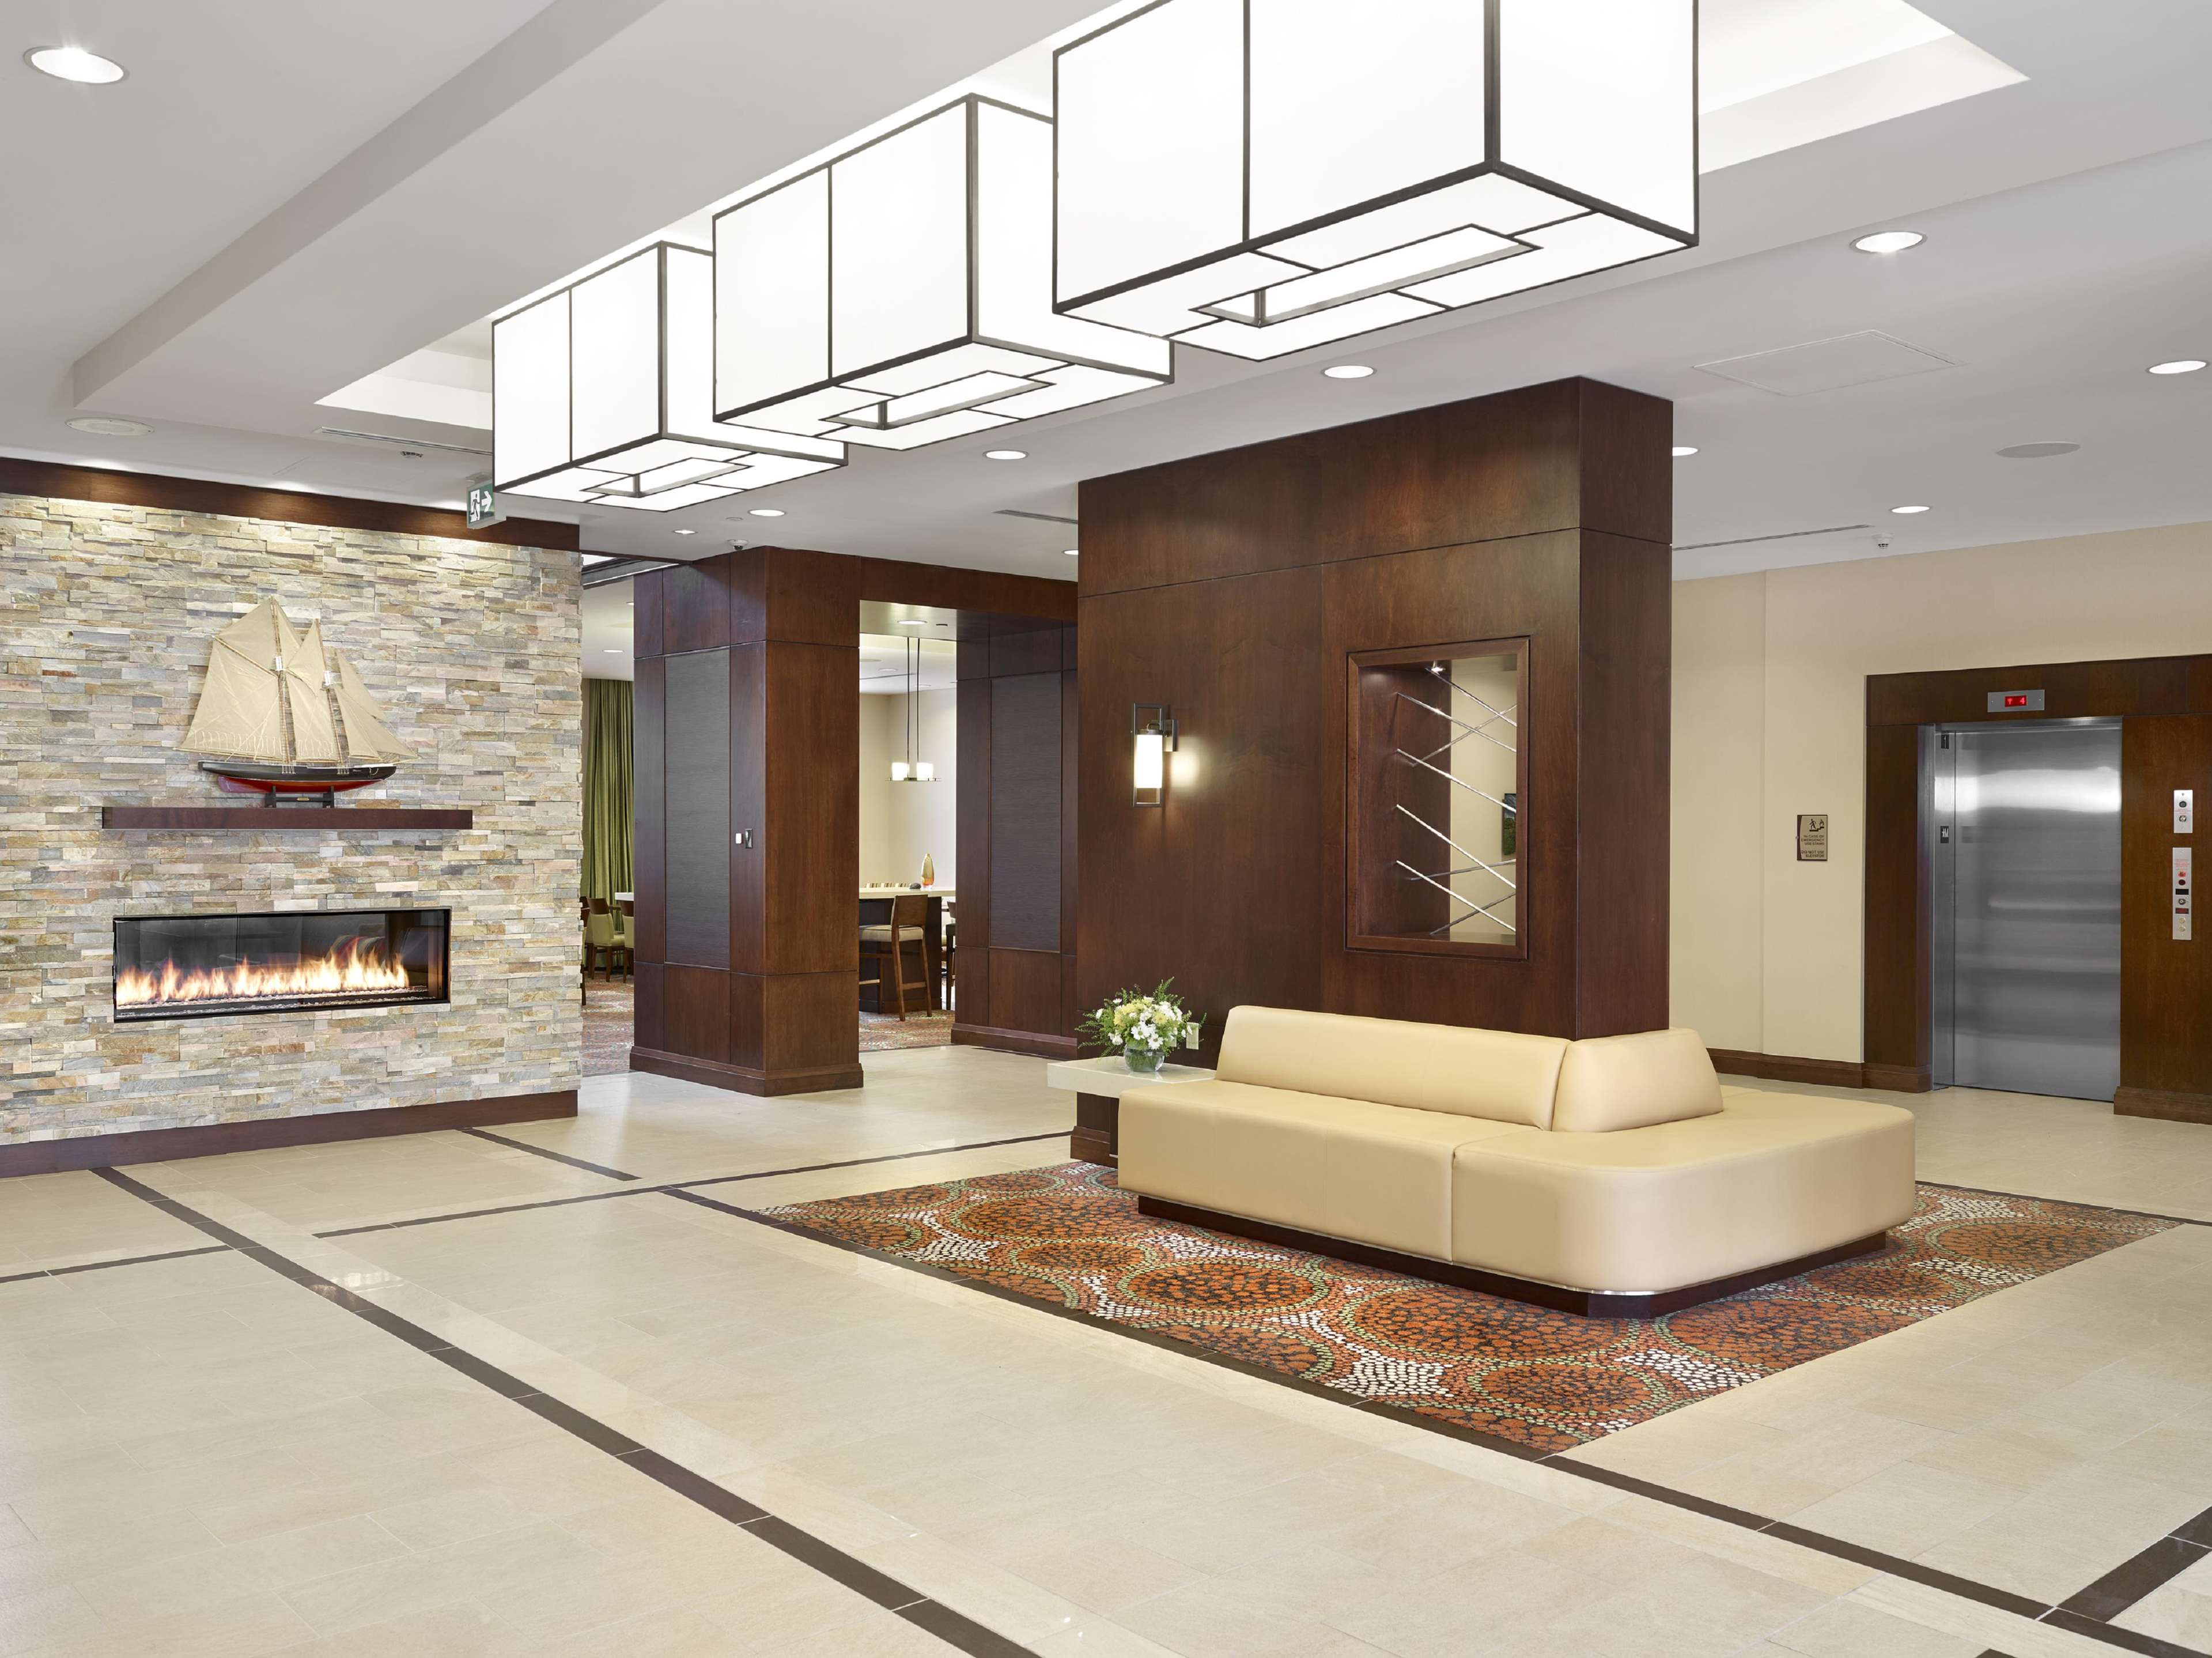 Homewood Suites by Hilton Halifax-Downtown, Nova Scotia, Canada